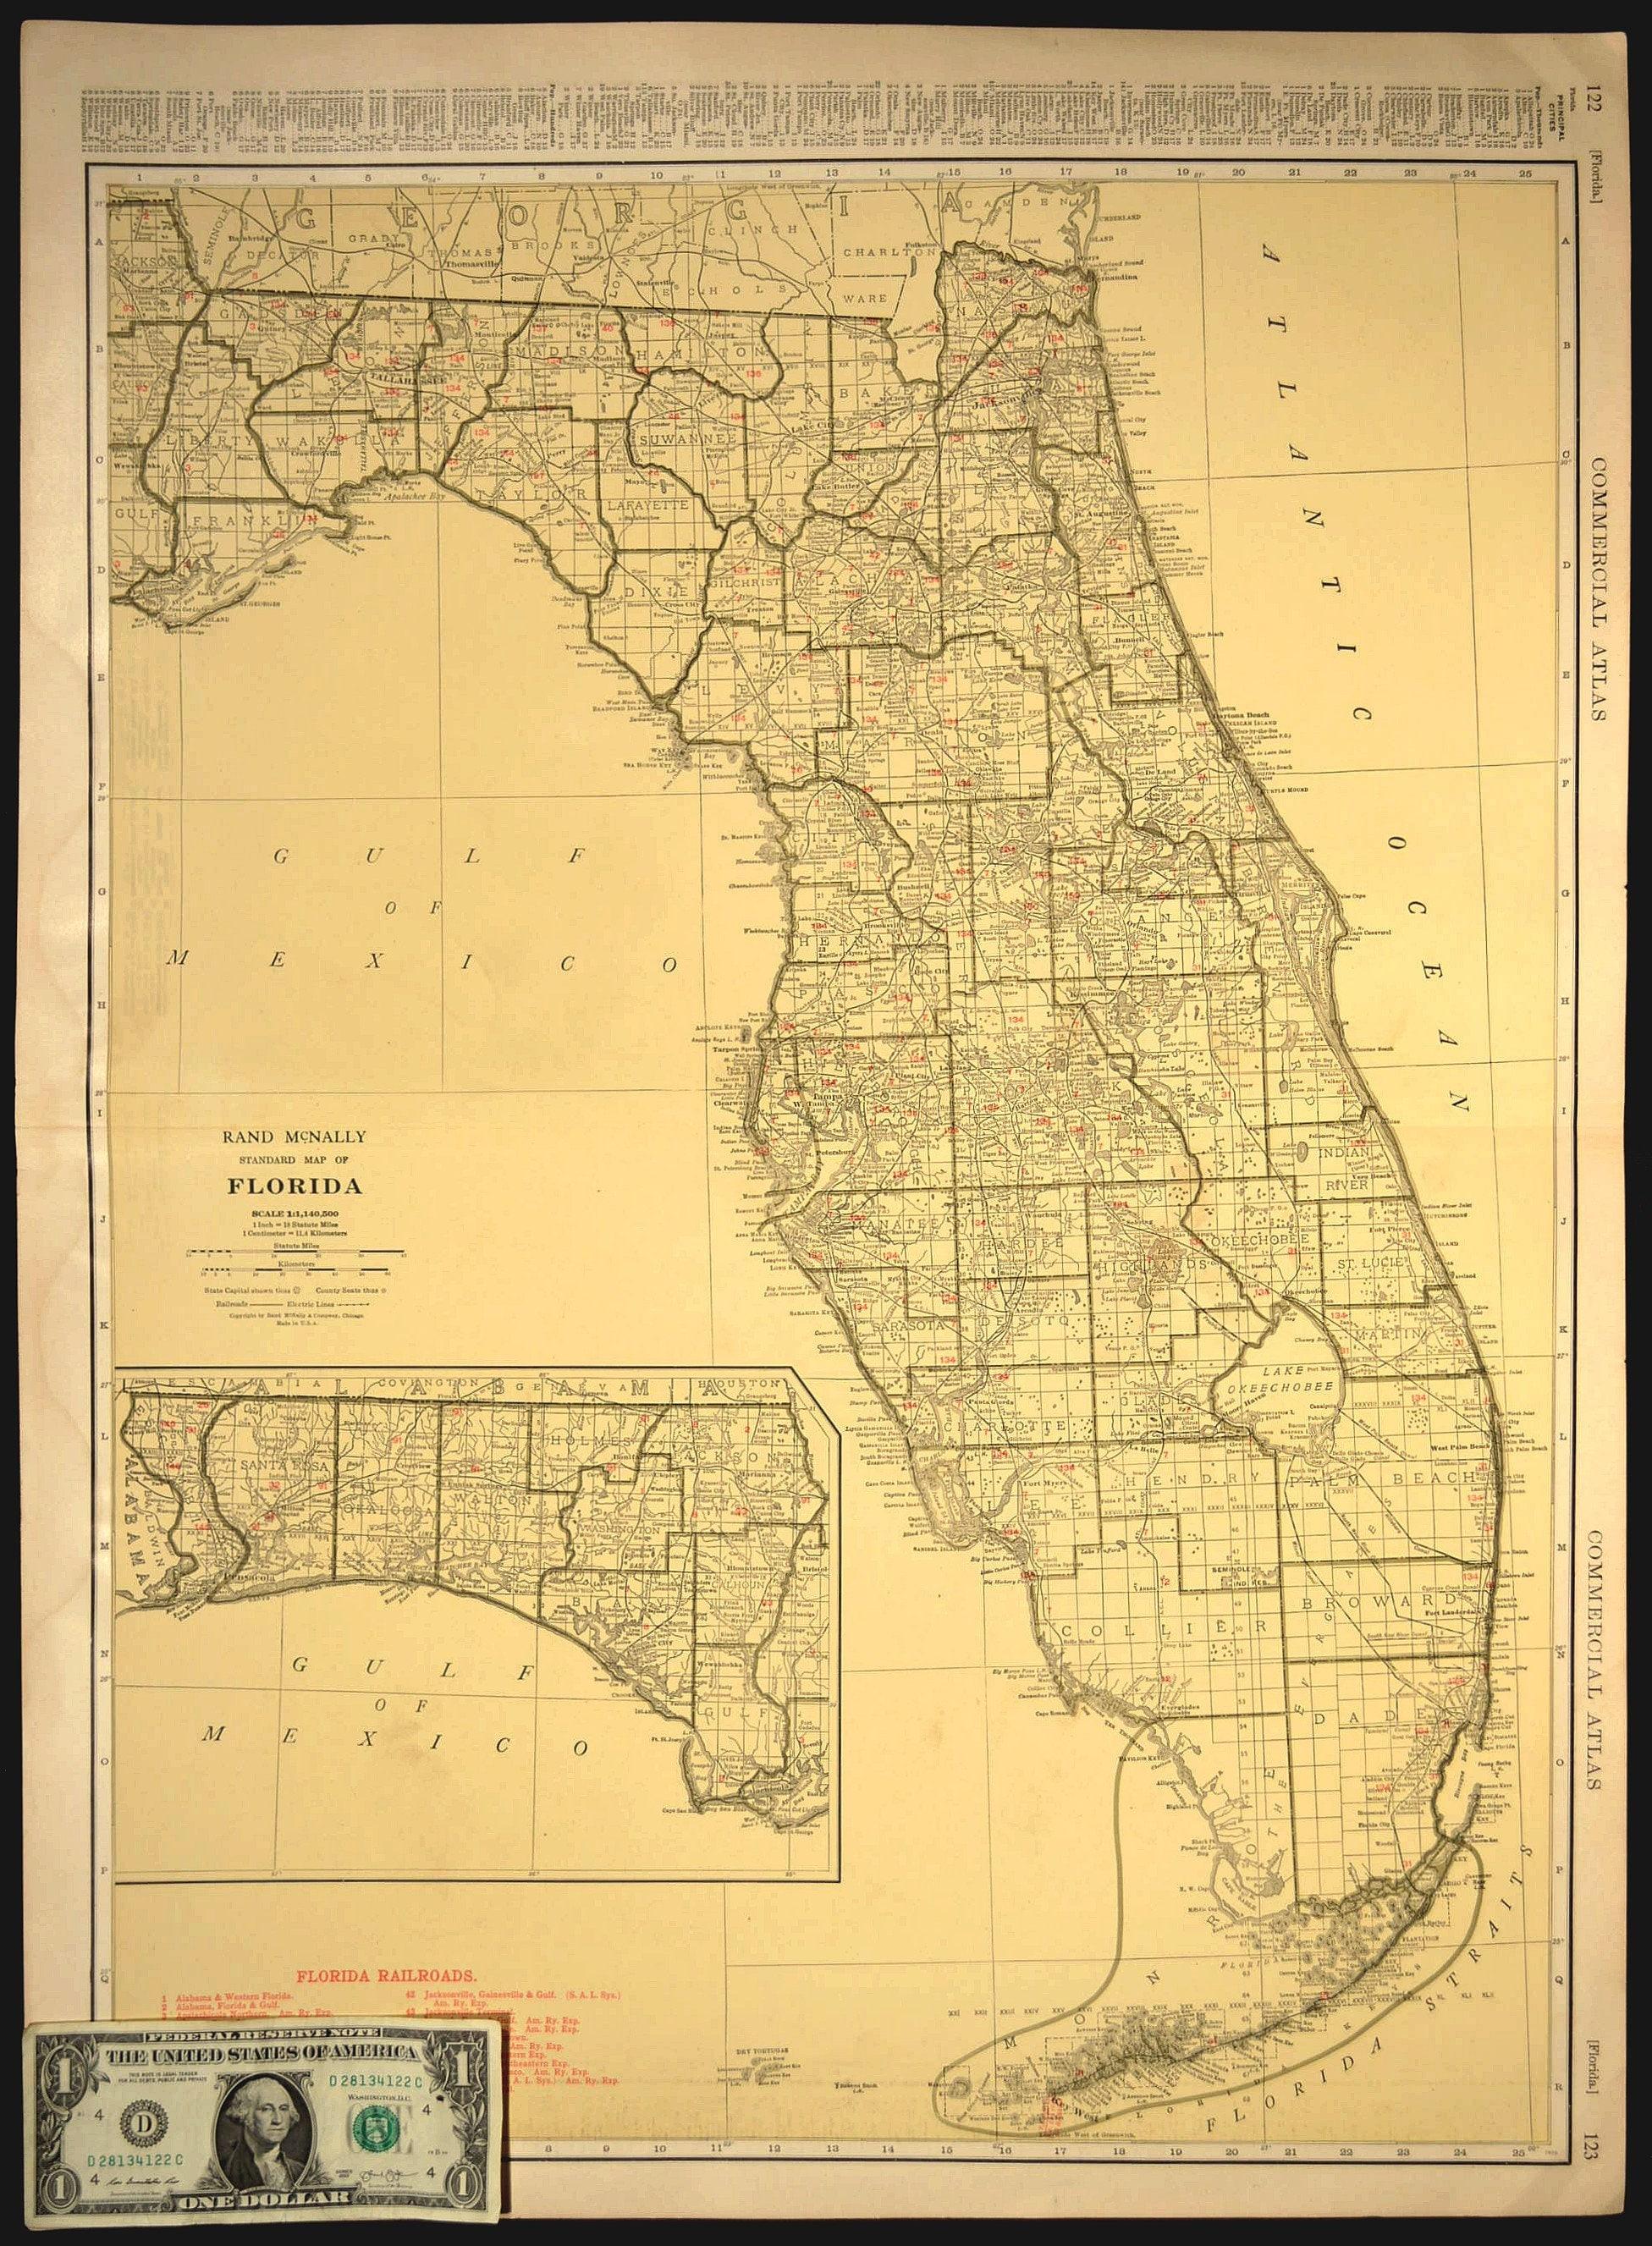 Florida Map EXTRA LARGE Florida Railroad Map Wall Art